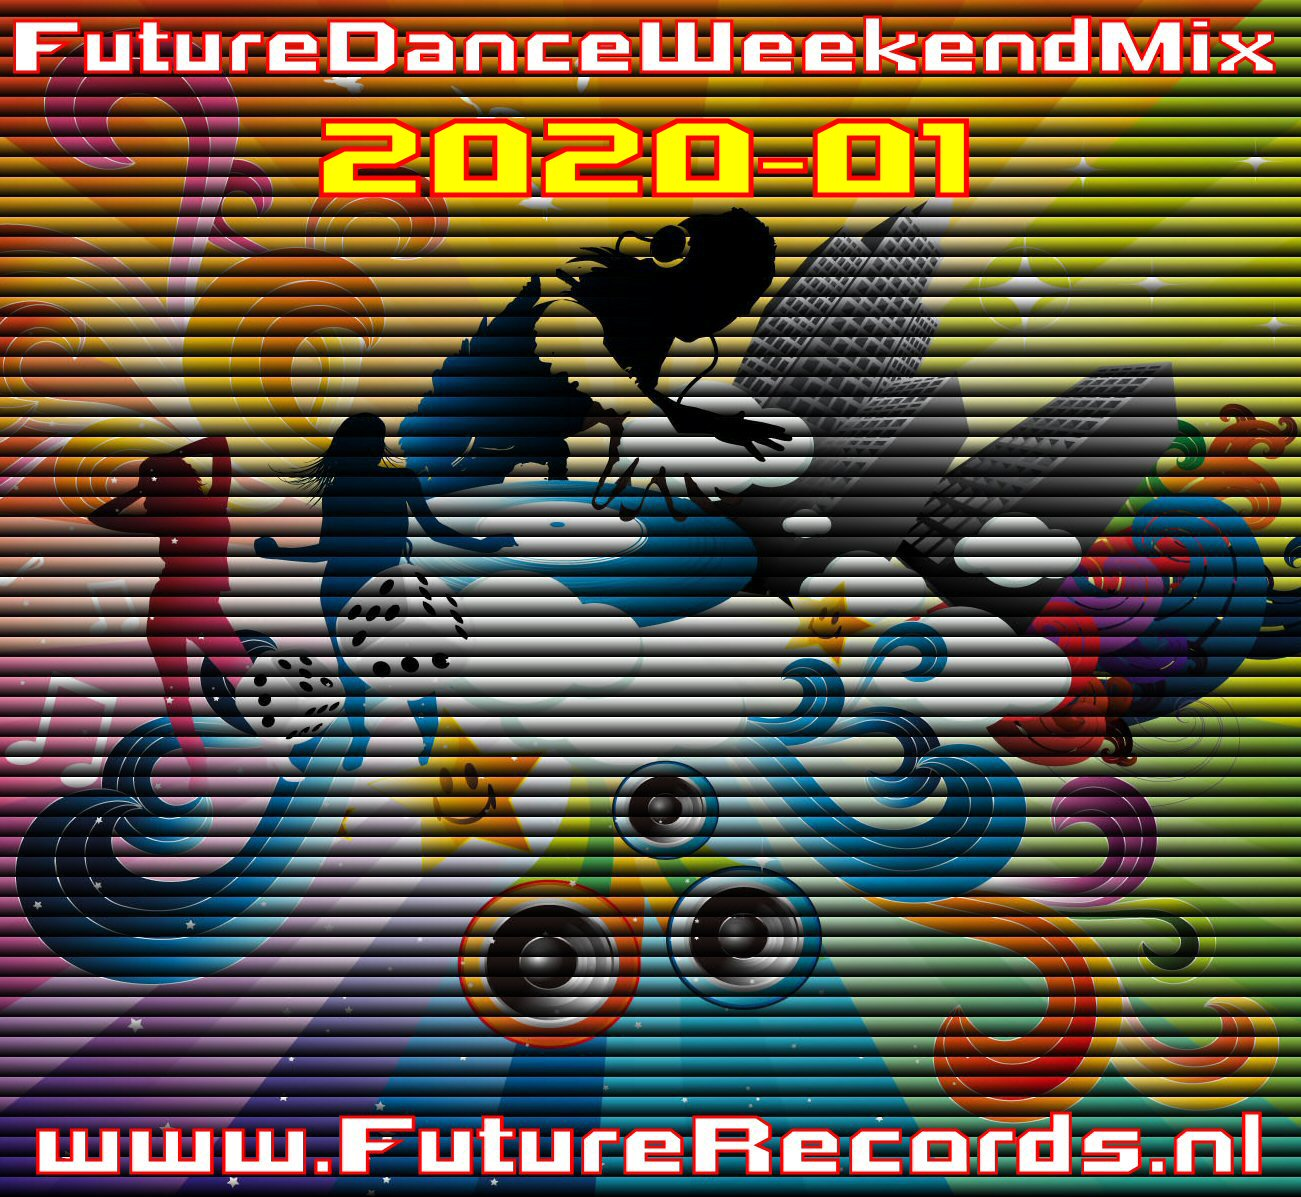 Future Dance Weekend Mix 2020-01